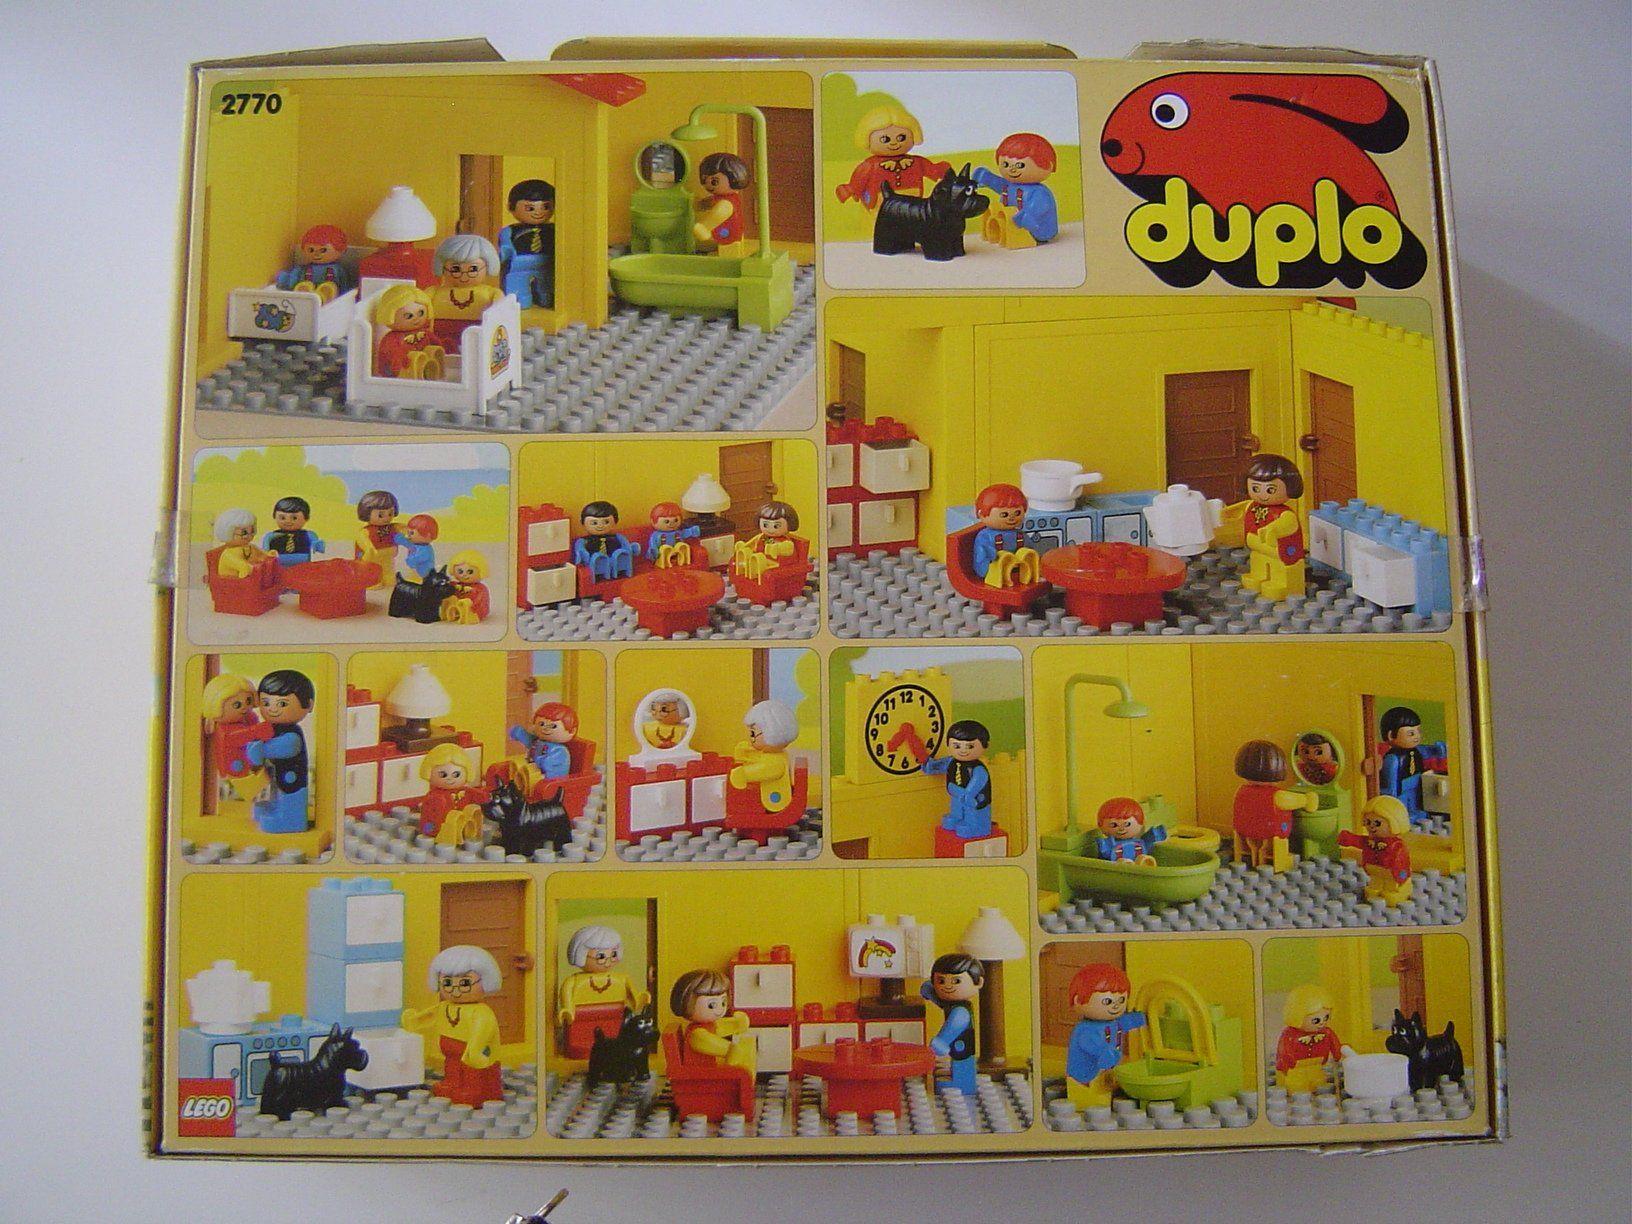 lego duplo 2770 haus inklusive m bel 58 teile spielzeug duplo pinterest lego. Black Bedroom Furniture Sets. Home Design Ideas